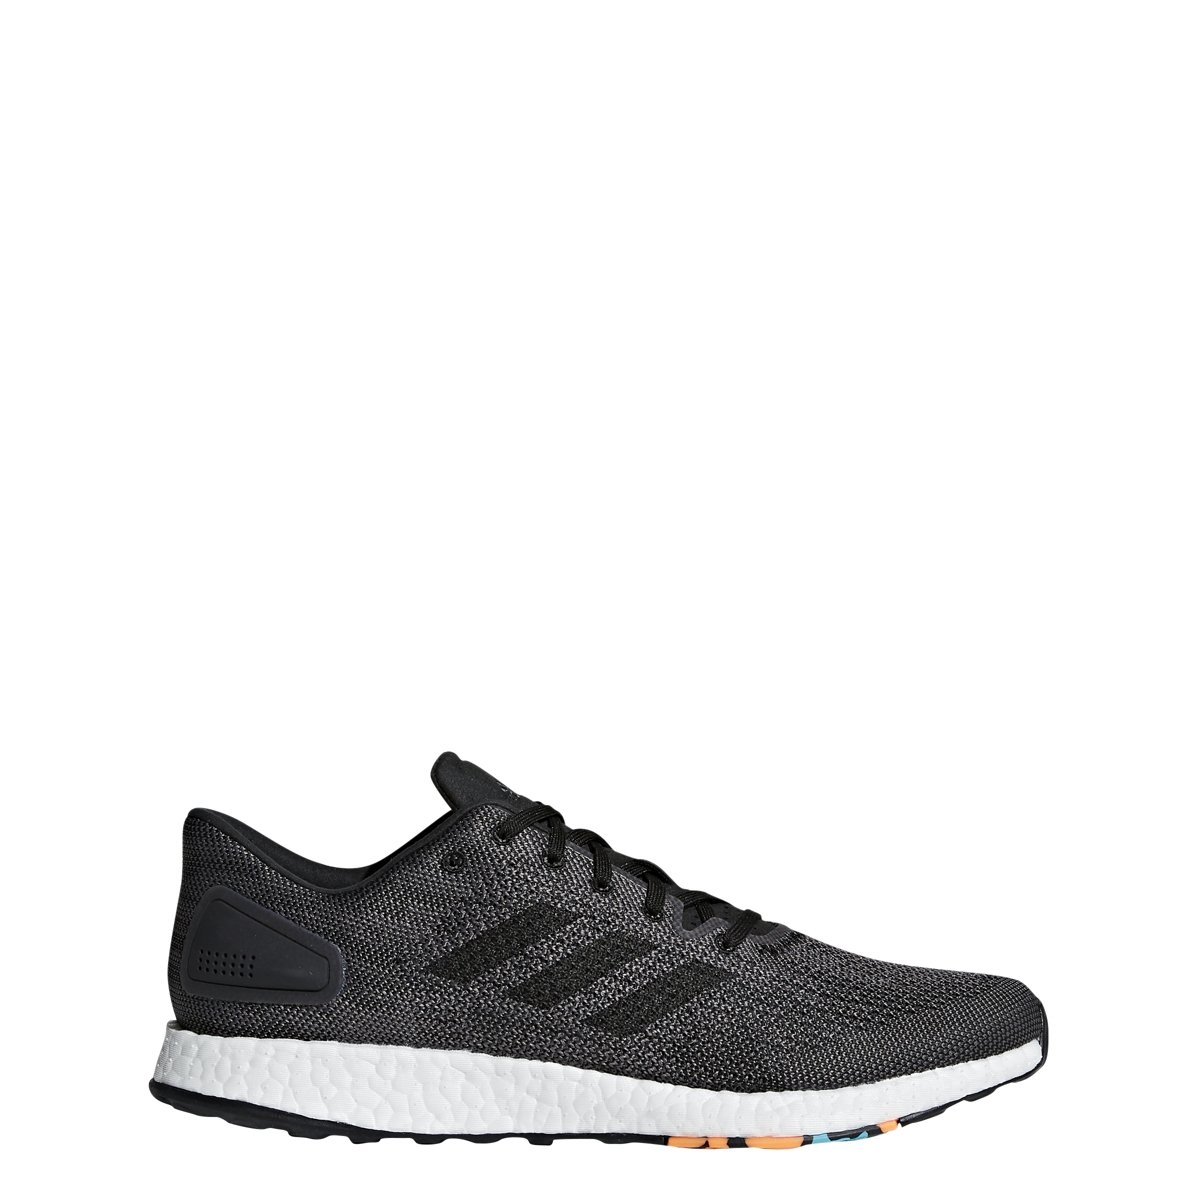 adidas Men's Pureboost DPR Running Shoe B077XK58XN 4.5 D(M) US|Black/Black/Grey